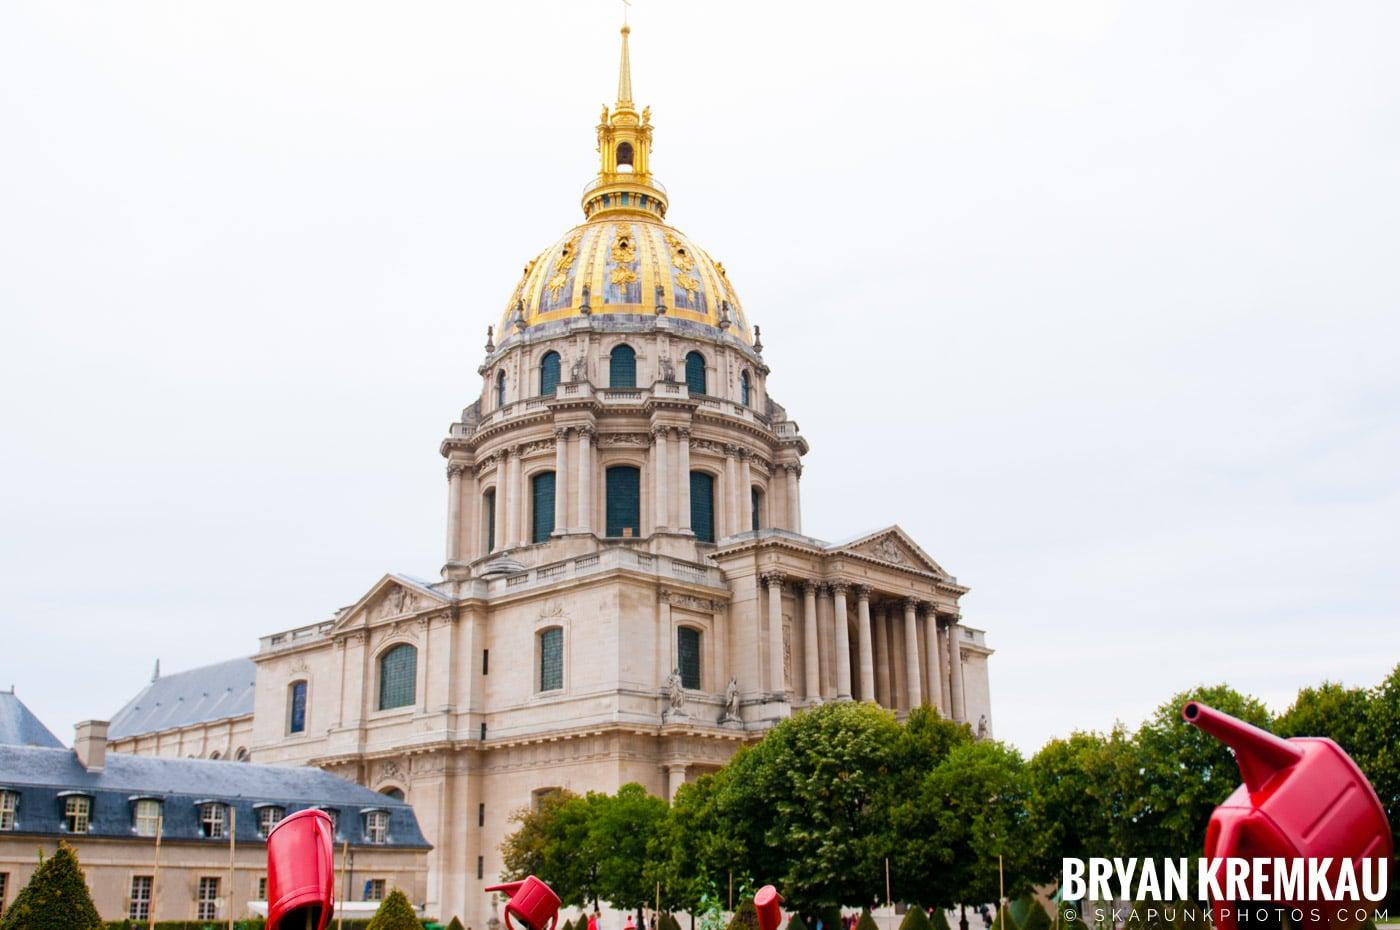 Paris, France Honeymoon - Day 3 - 7.20.11 (11)